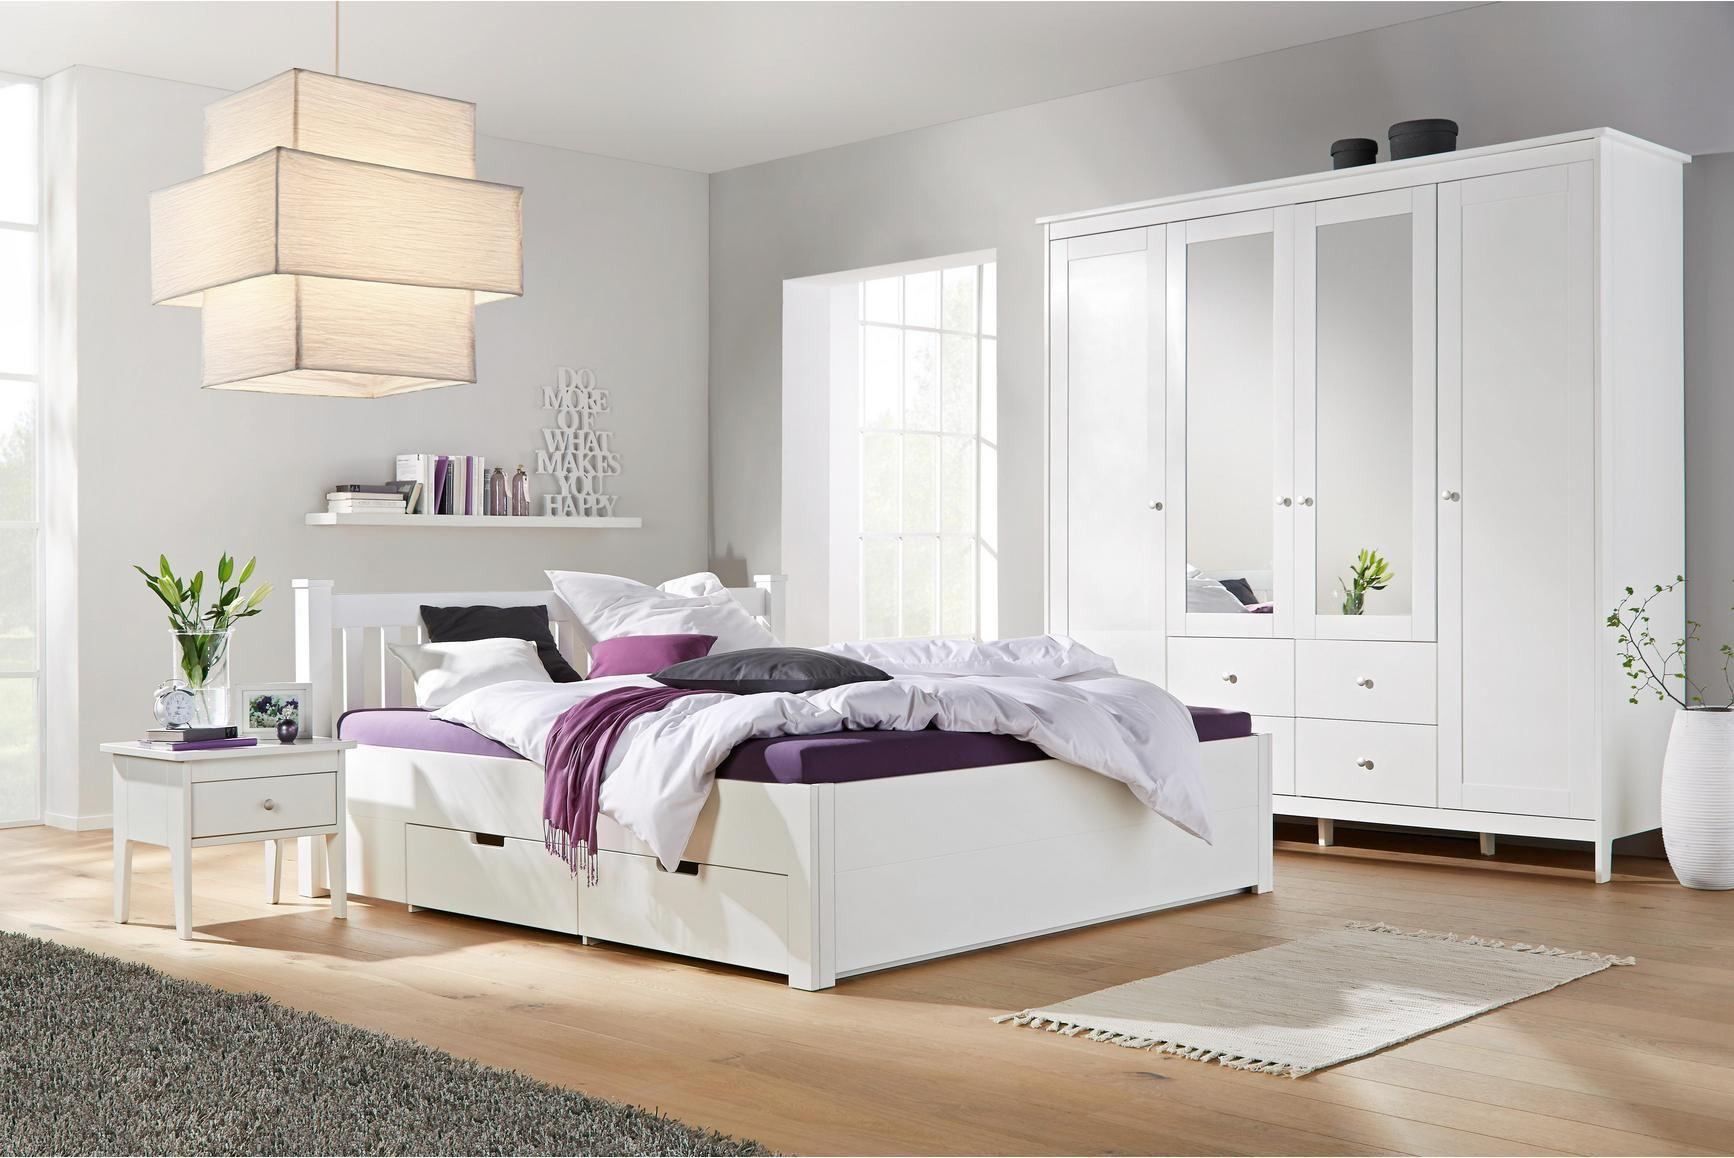 Agykeret Lyon Home Diy Home Decor Bed Storage